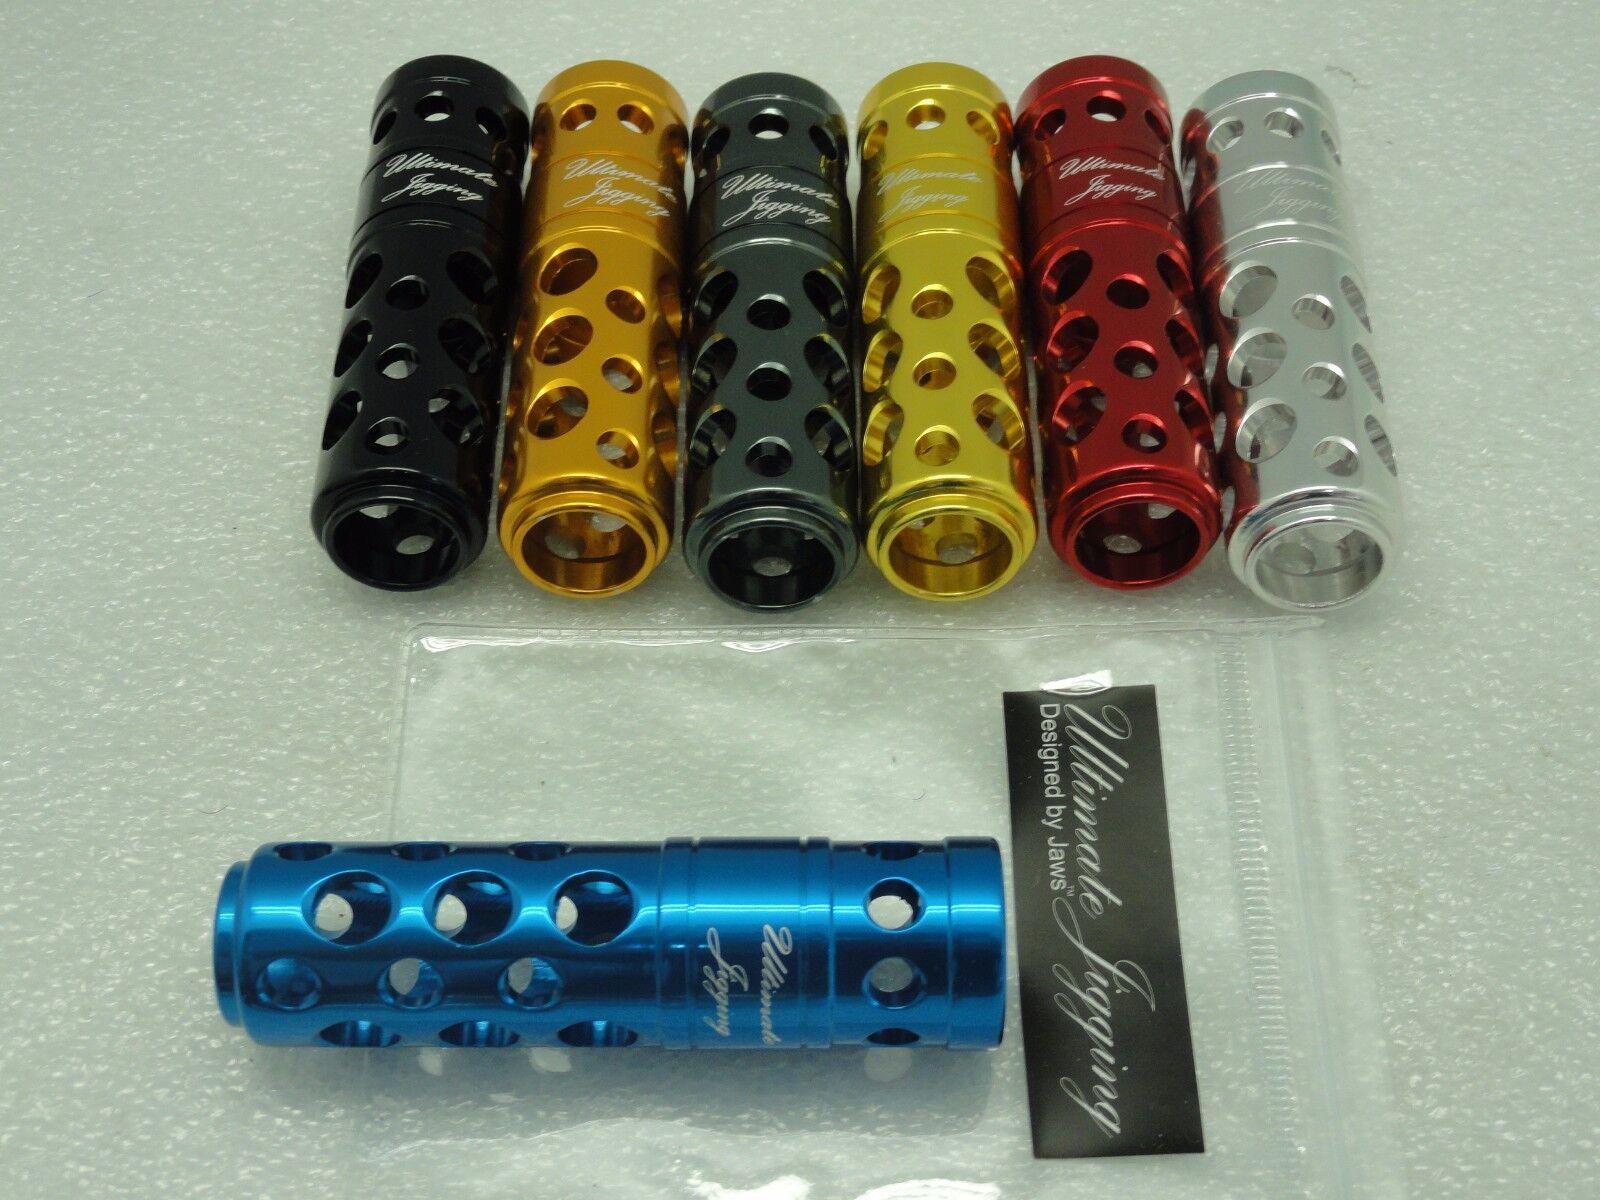 Uj T052a T-Stange Griff Knauf Direct Fit Avet SX Mxl Mxl Mxl Jx LX Hxw Mc Raptor Rolle 8504b7